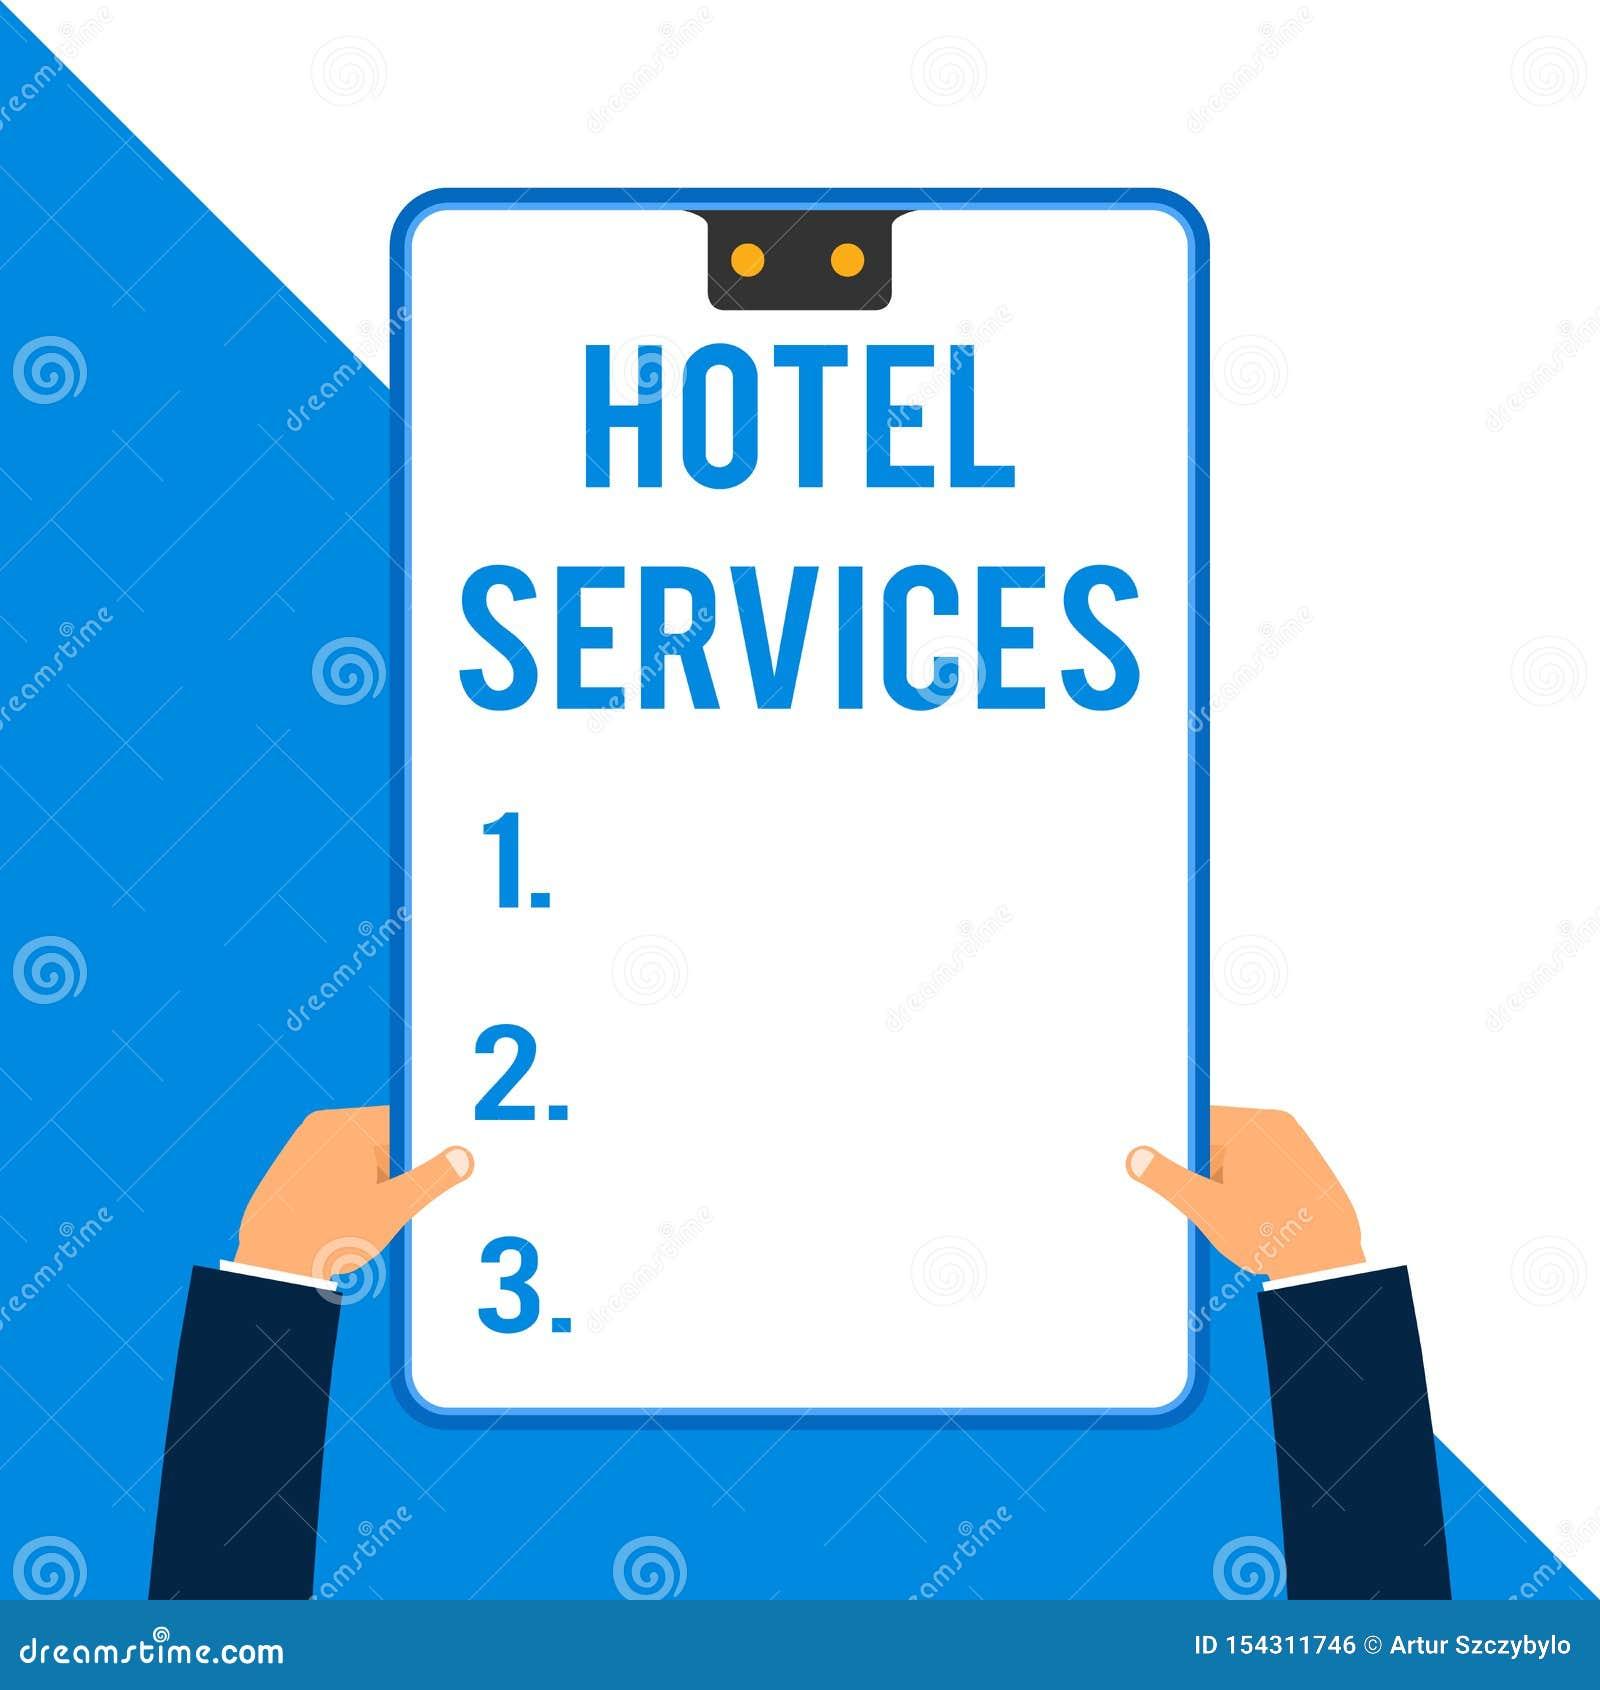 Hotel service essay